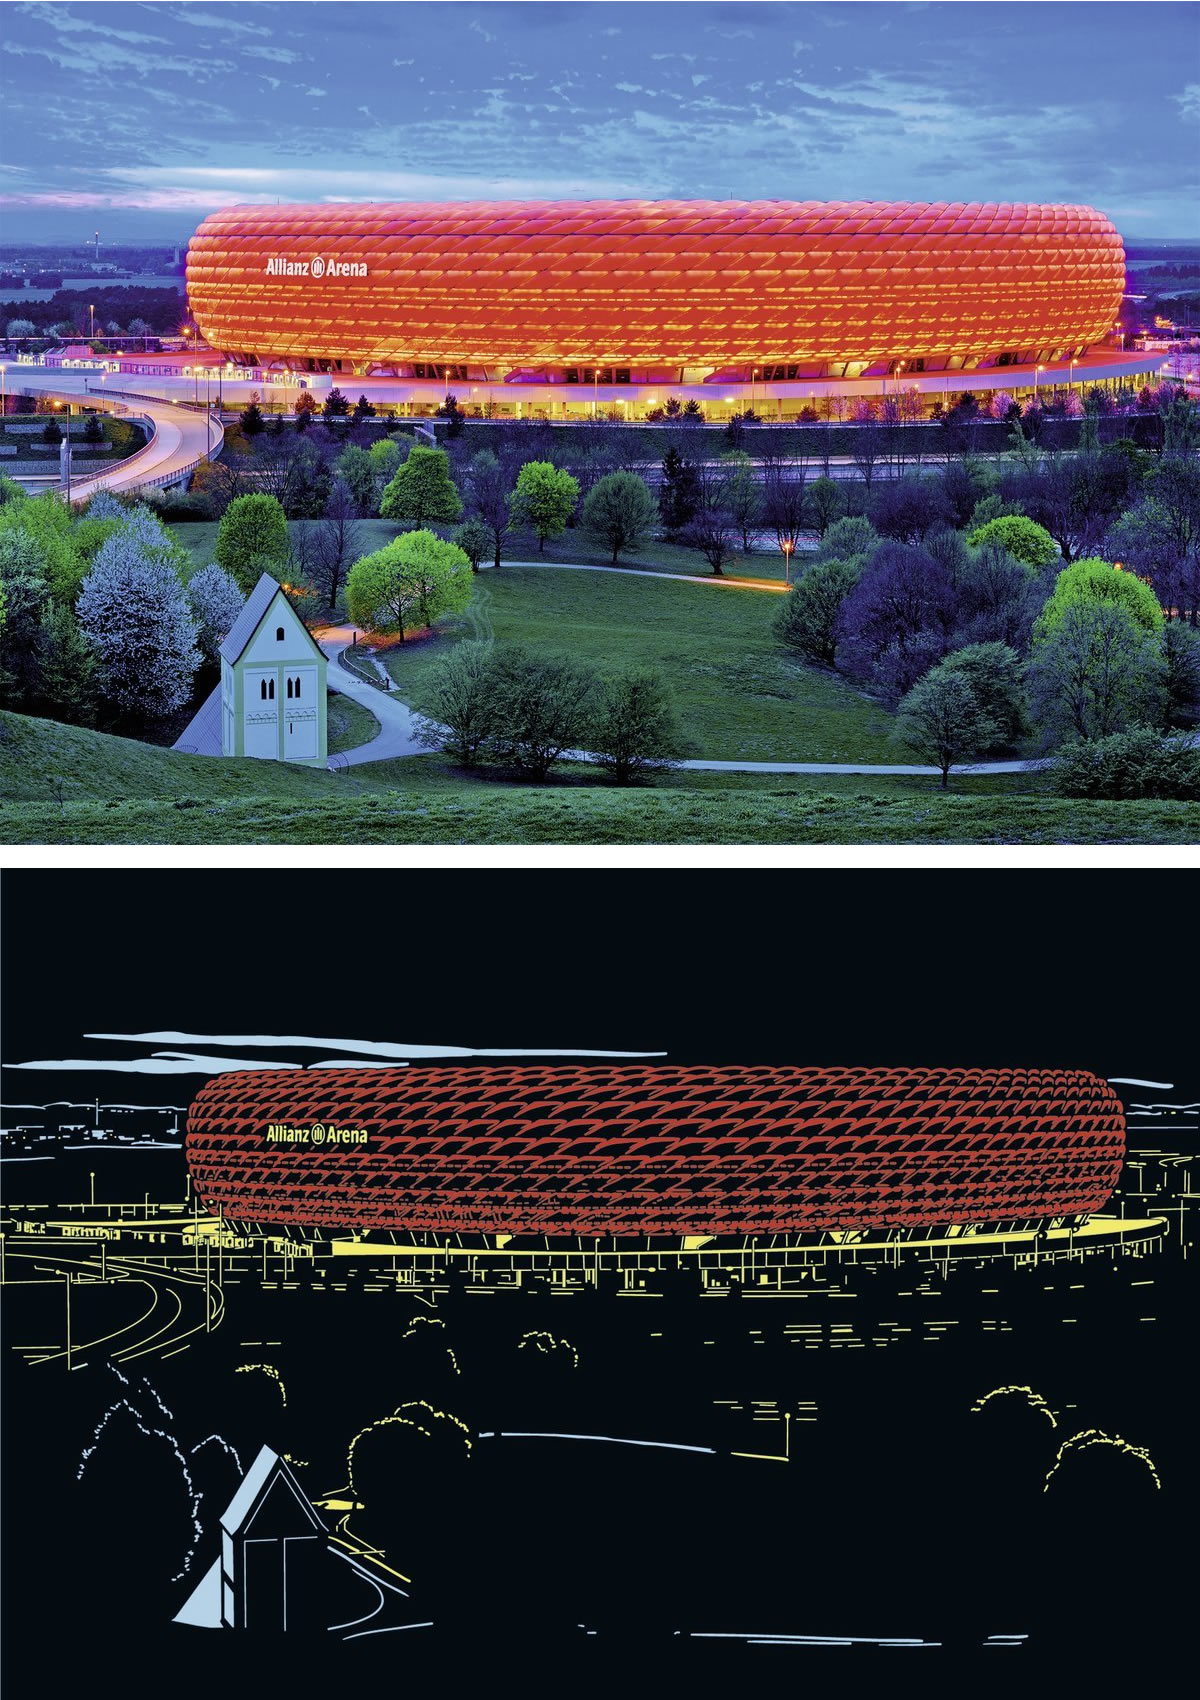 Puzzle Ravensburger Alianz Arena, Bayer Munich de 1200 Piezas